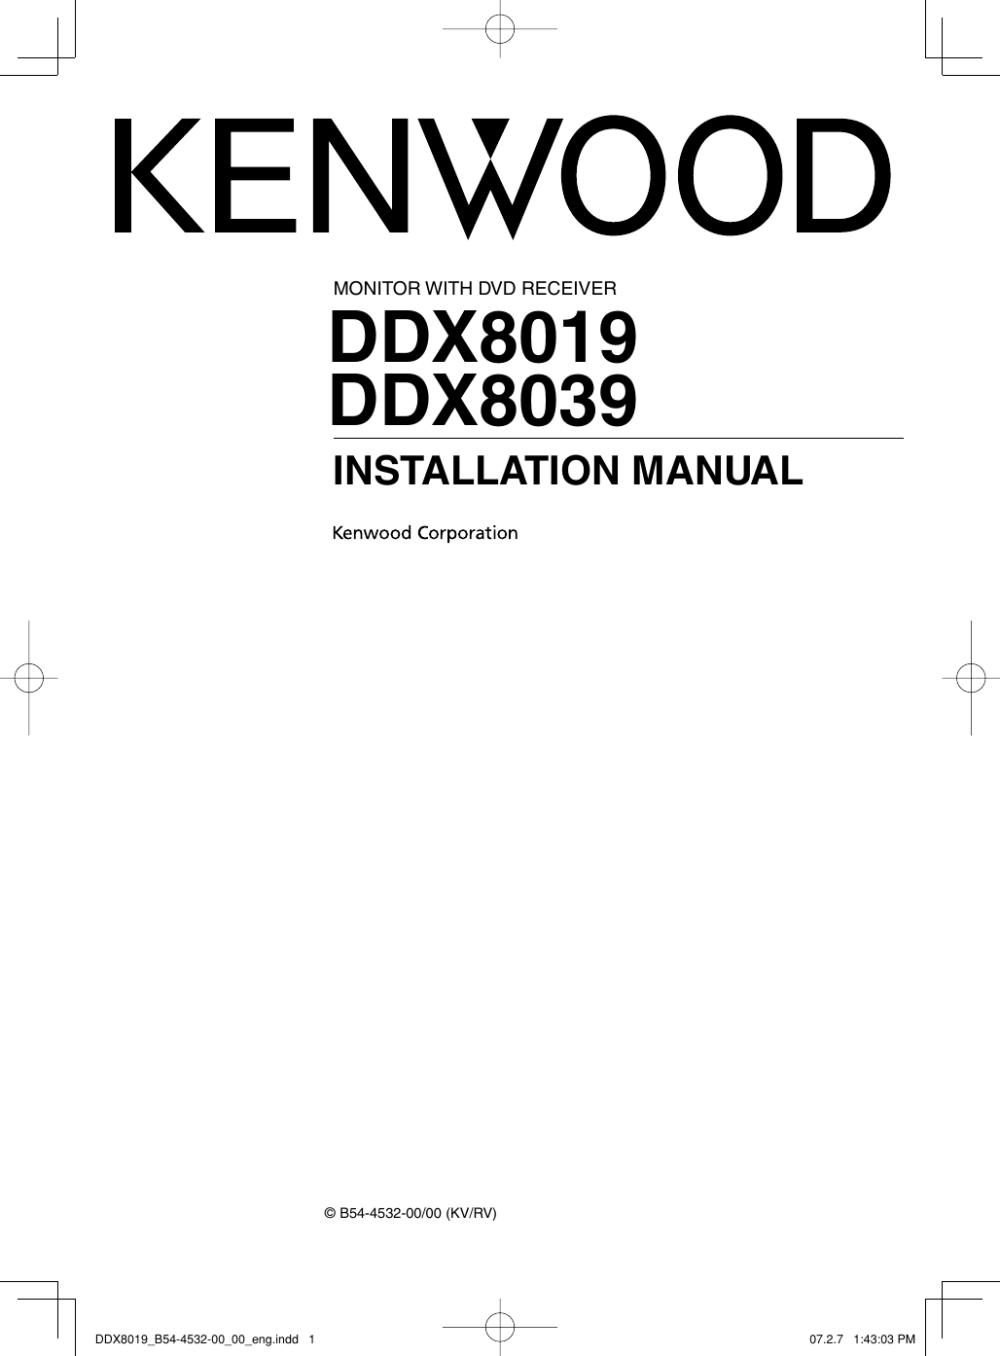 medium resolution of page 1 of 12 kenwood kenwood excelon ddx8019 users manual